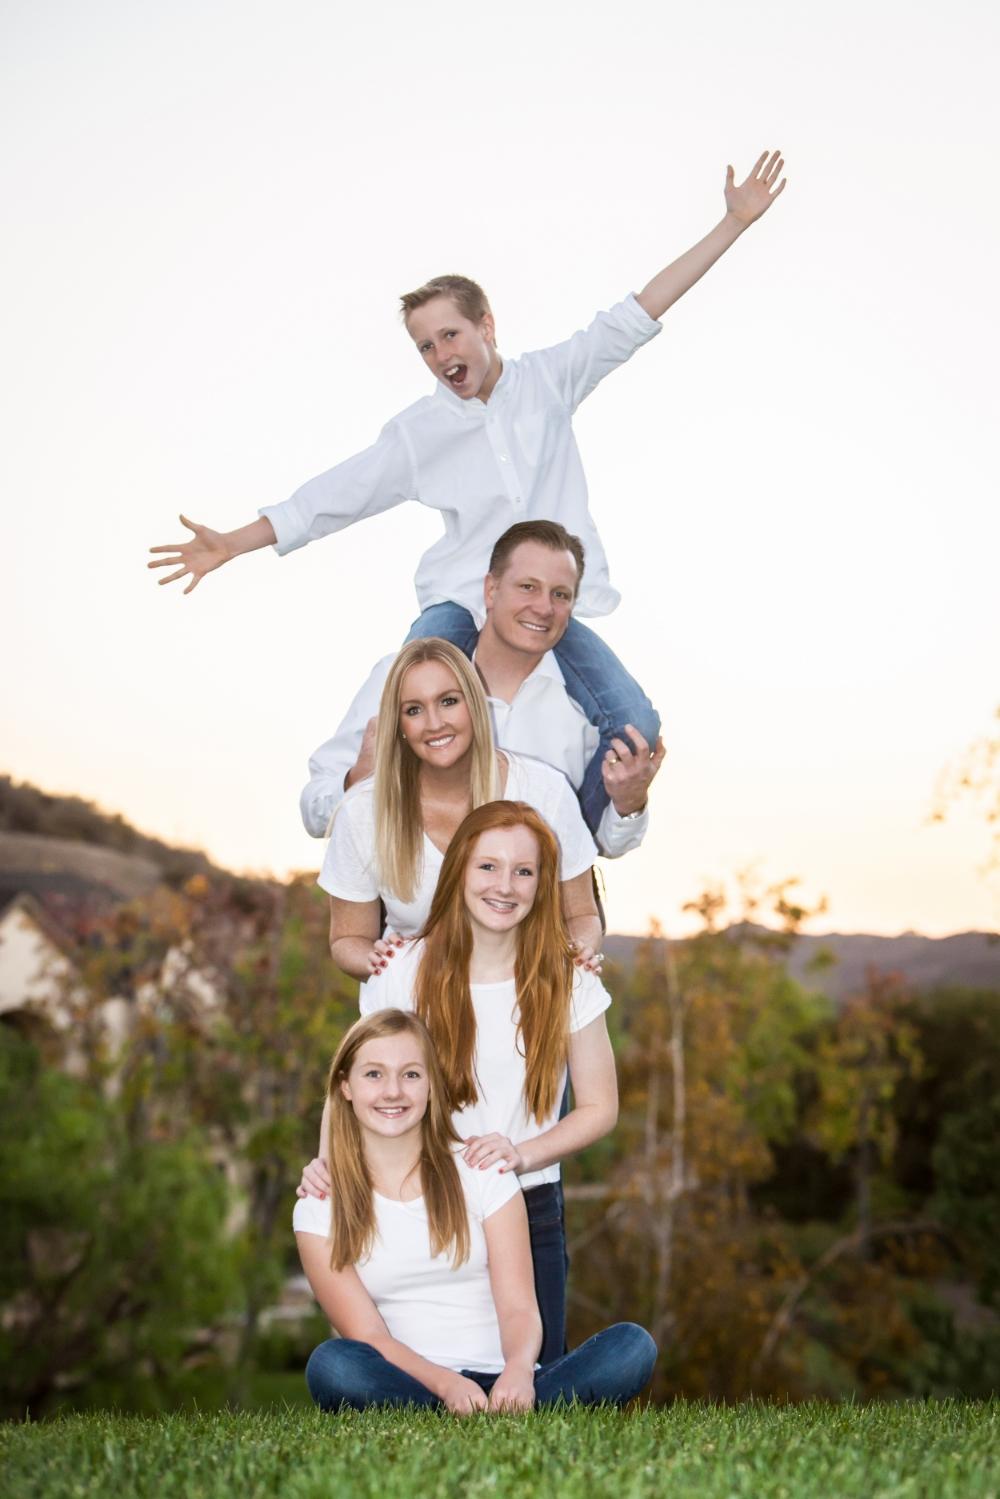 val-westover-photography-family-coto-de-caza-orange-county